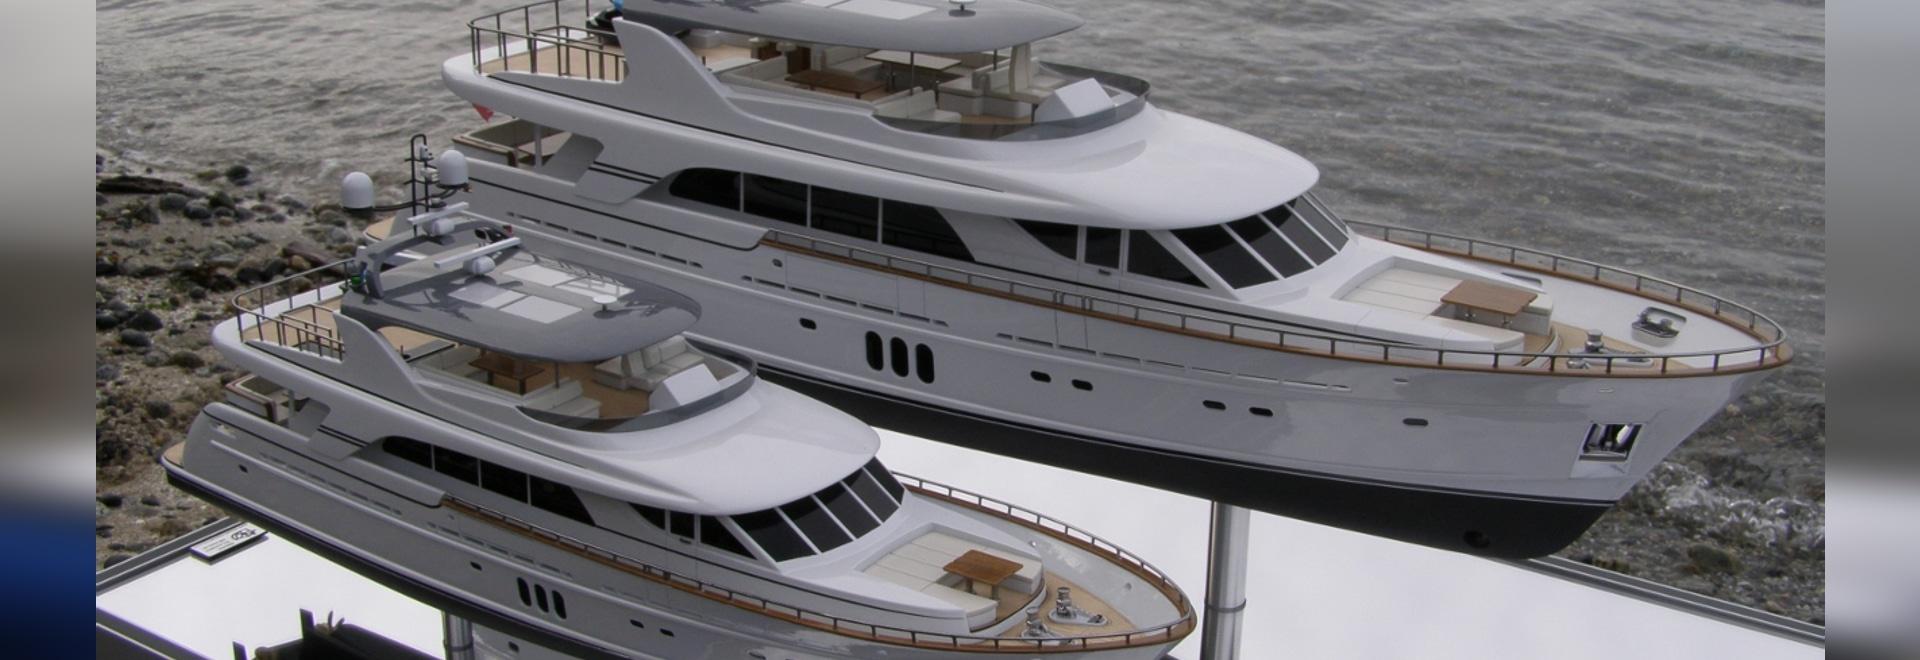 Neuigkeiten: 30m Mahalo Maßstab Modell